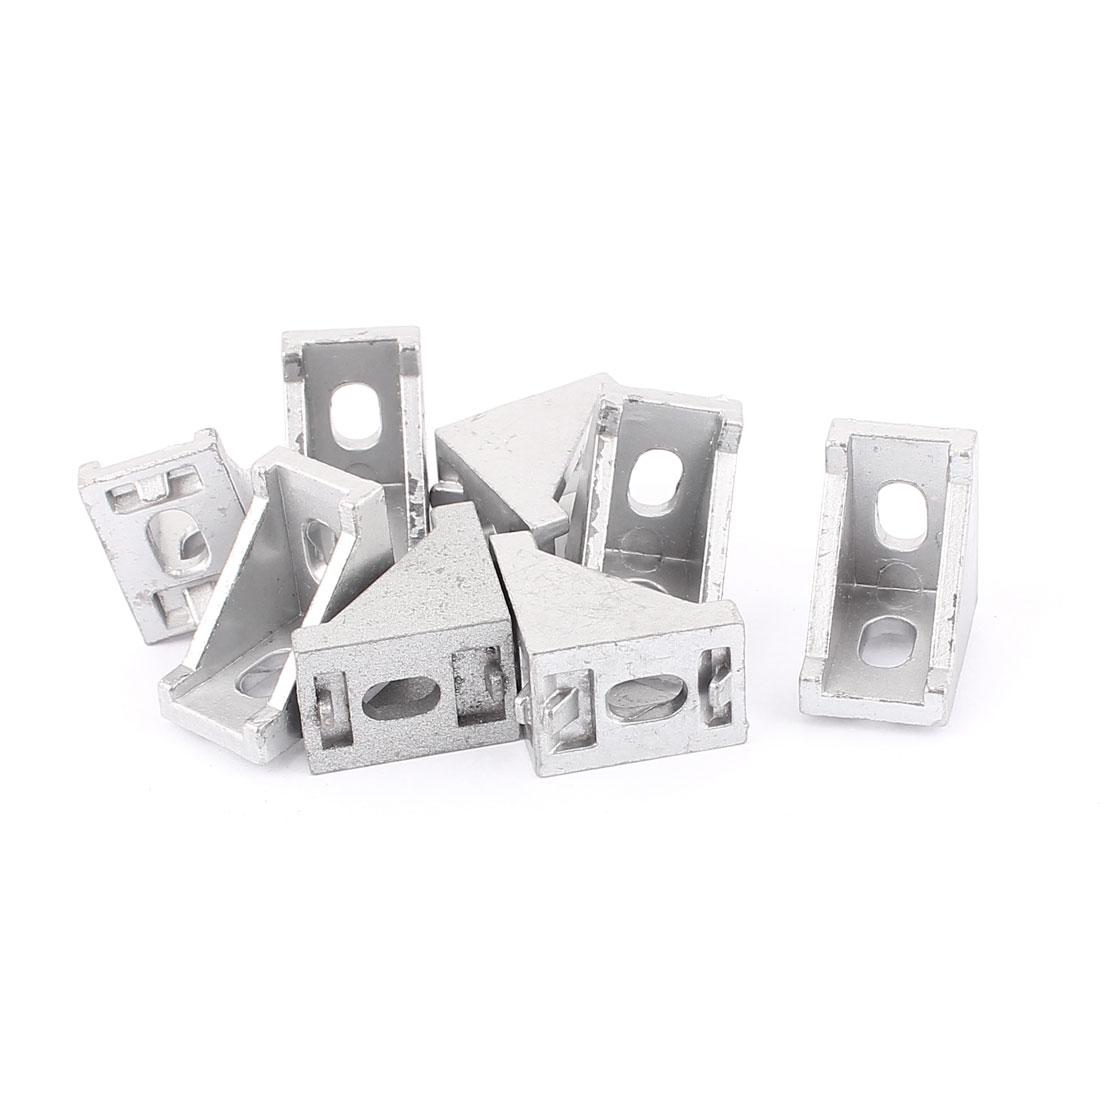 Silver Tone Aluminum Alloy 28x28x20mm Corner Brace Angle Bracket Support 8PCS